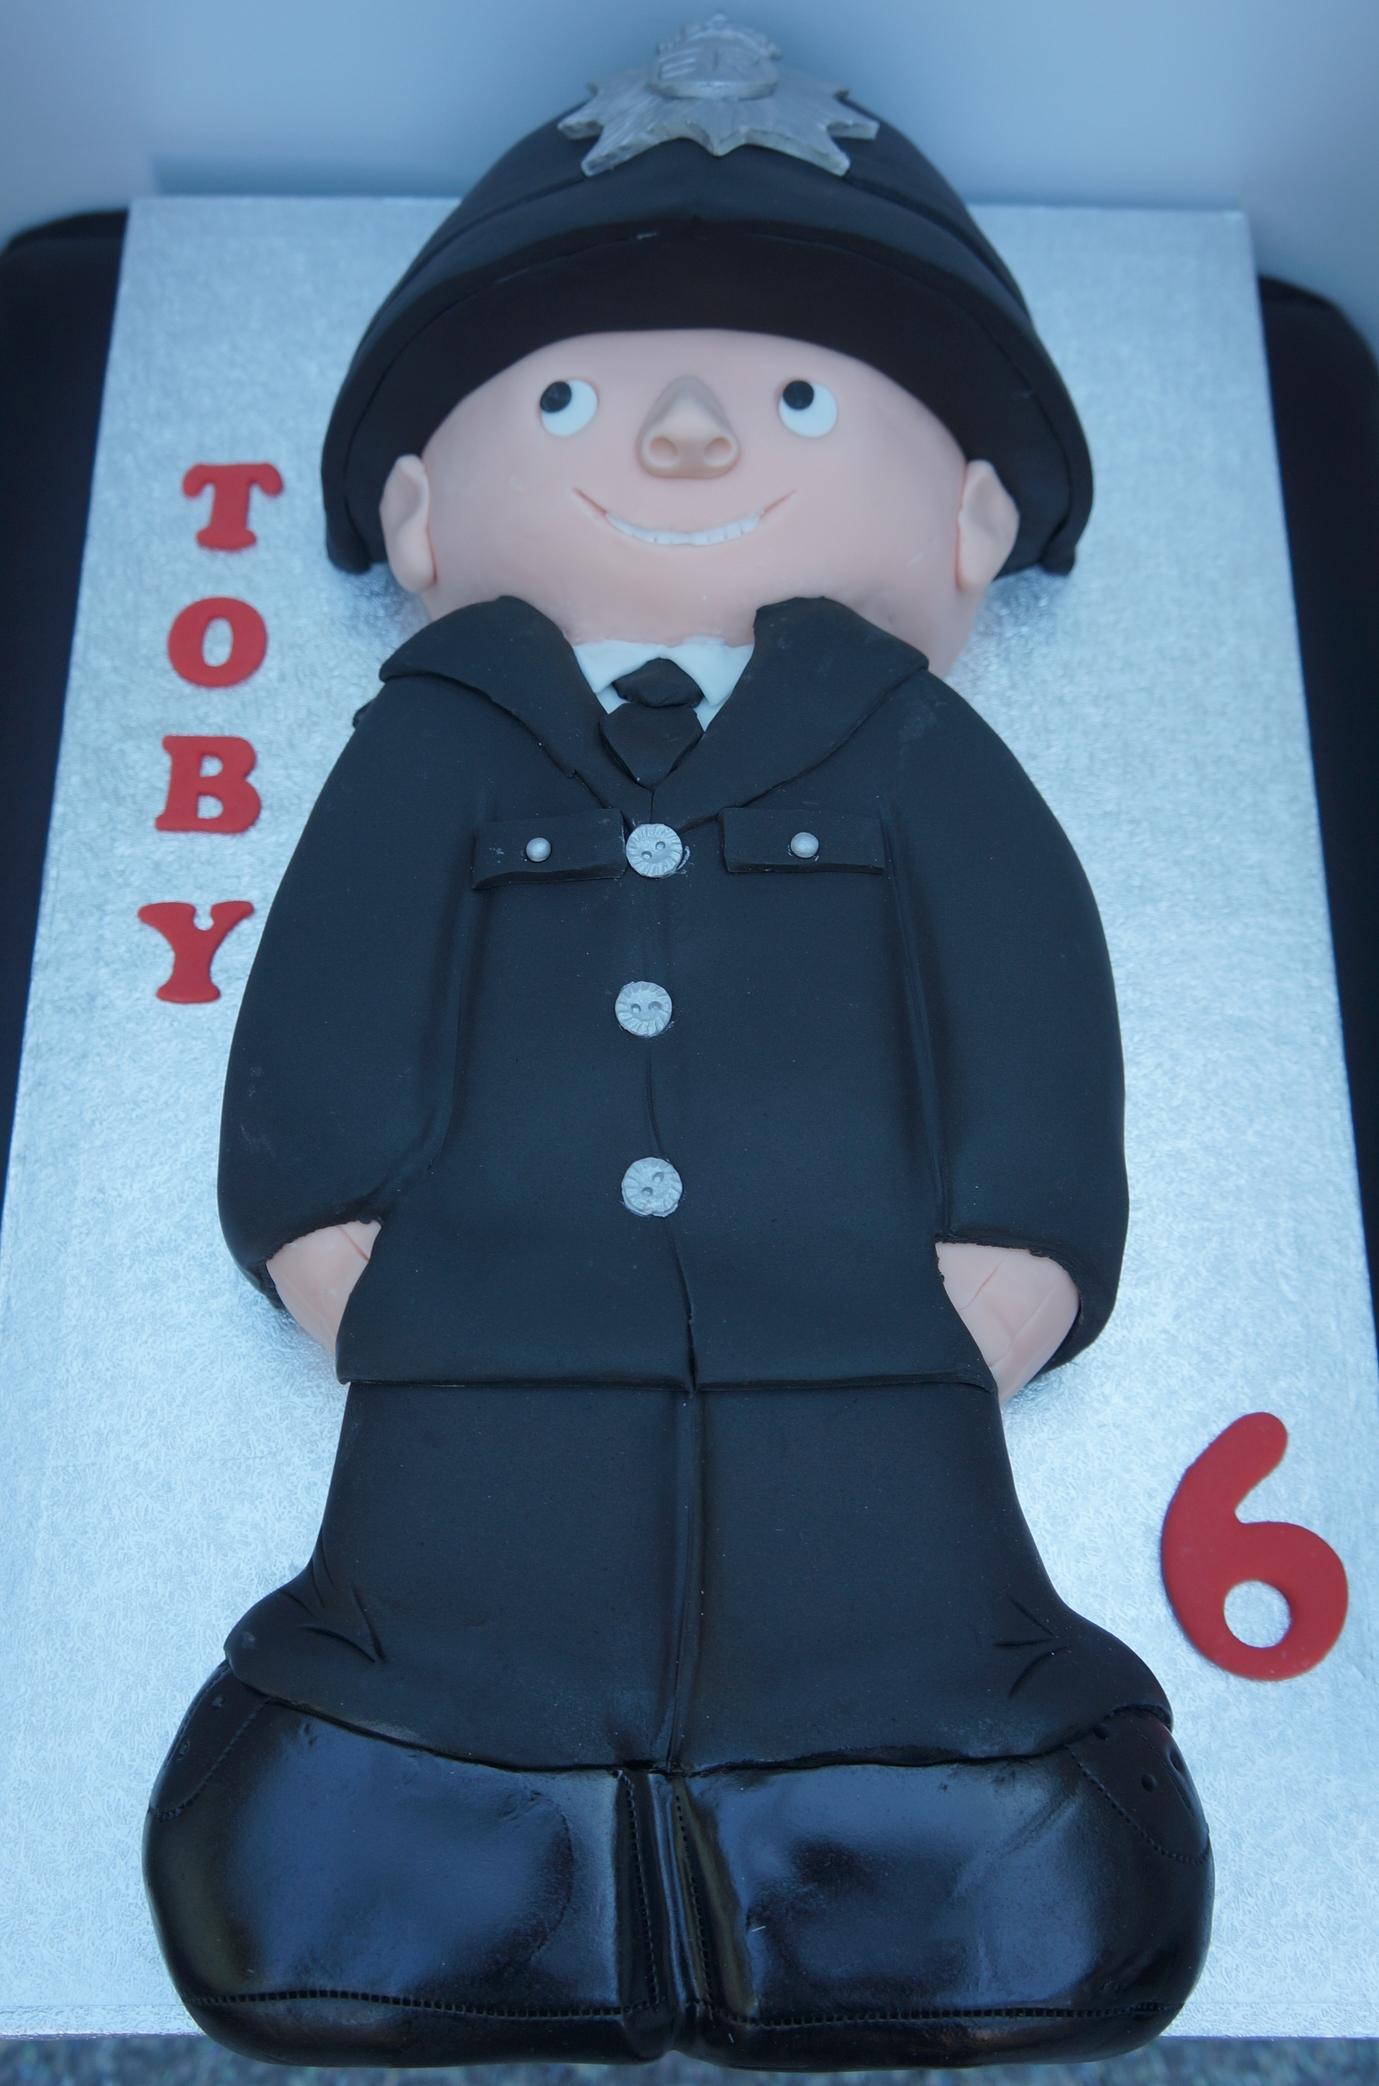 Policeman Birthday Cake 2014 02 28 083713